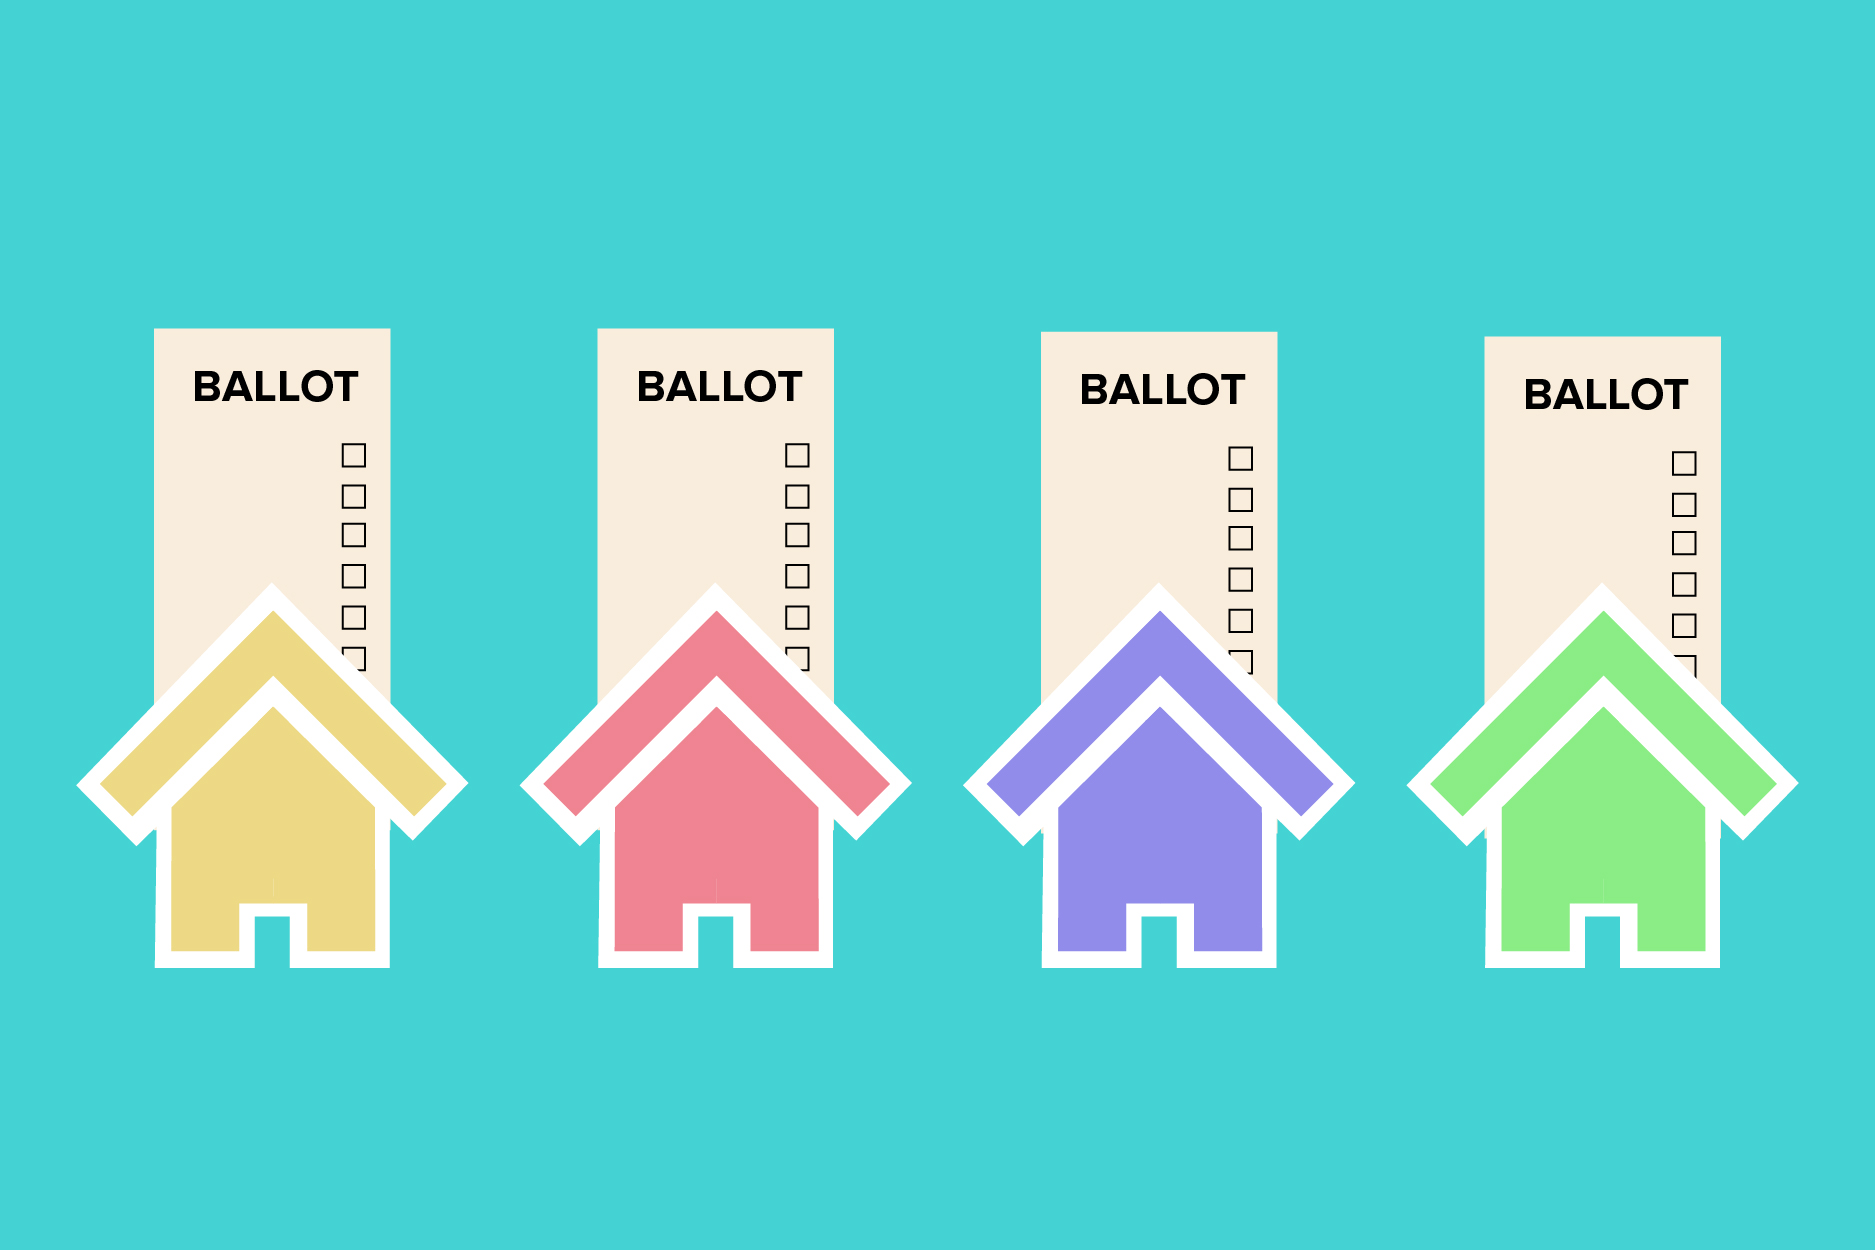 Davis housing crisis comes to the ballot box